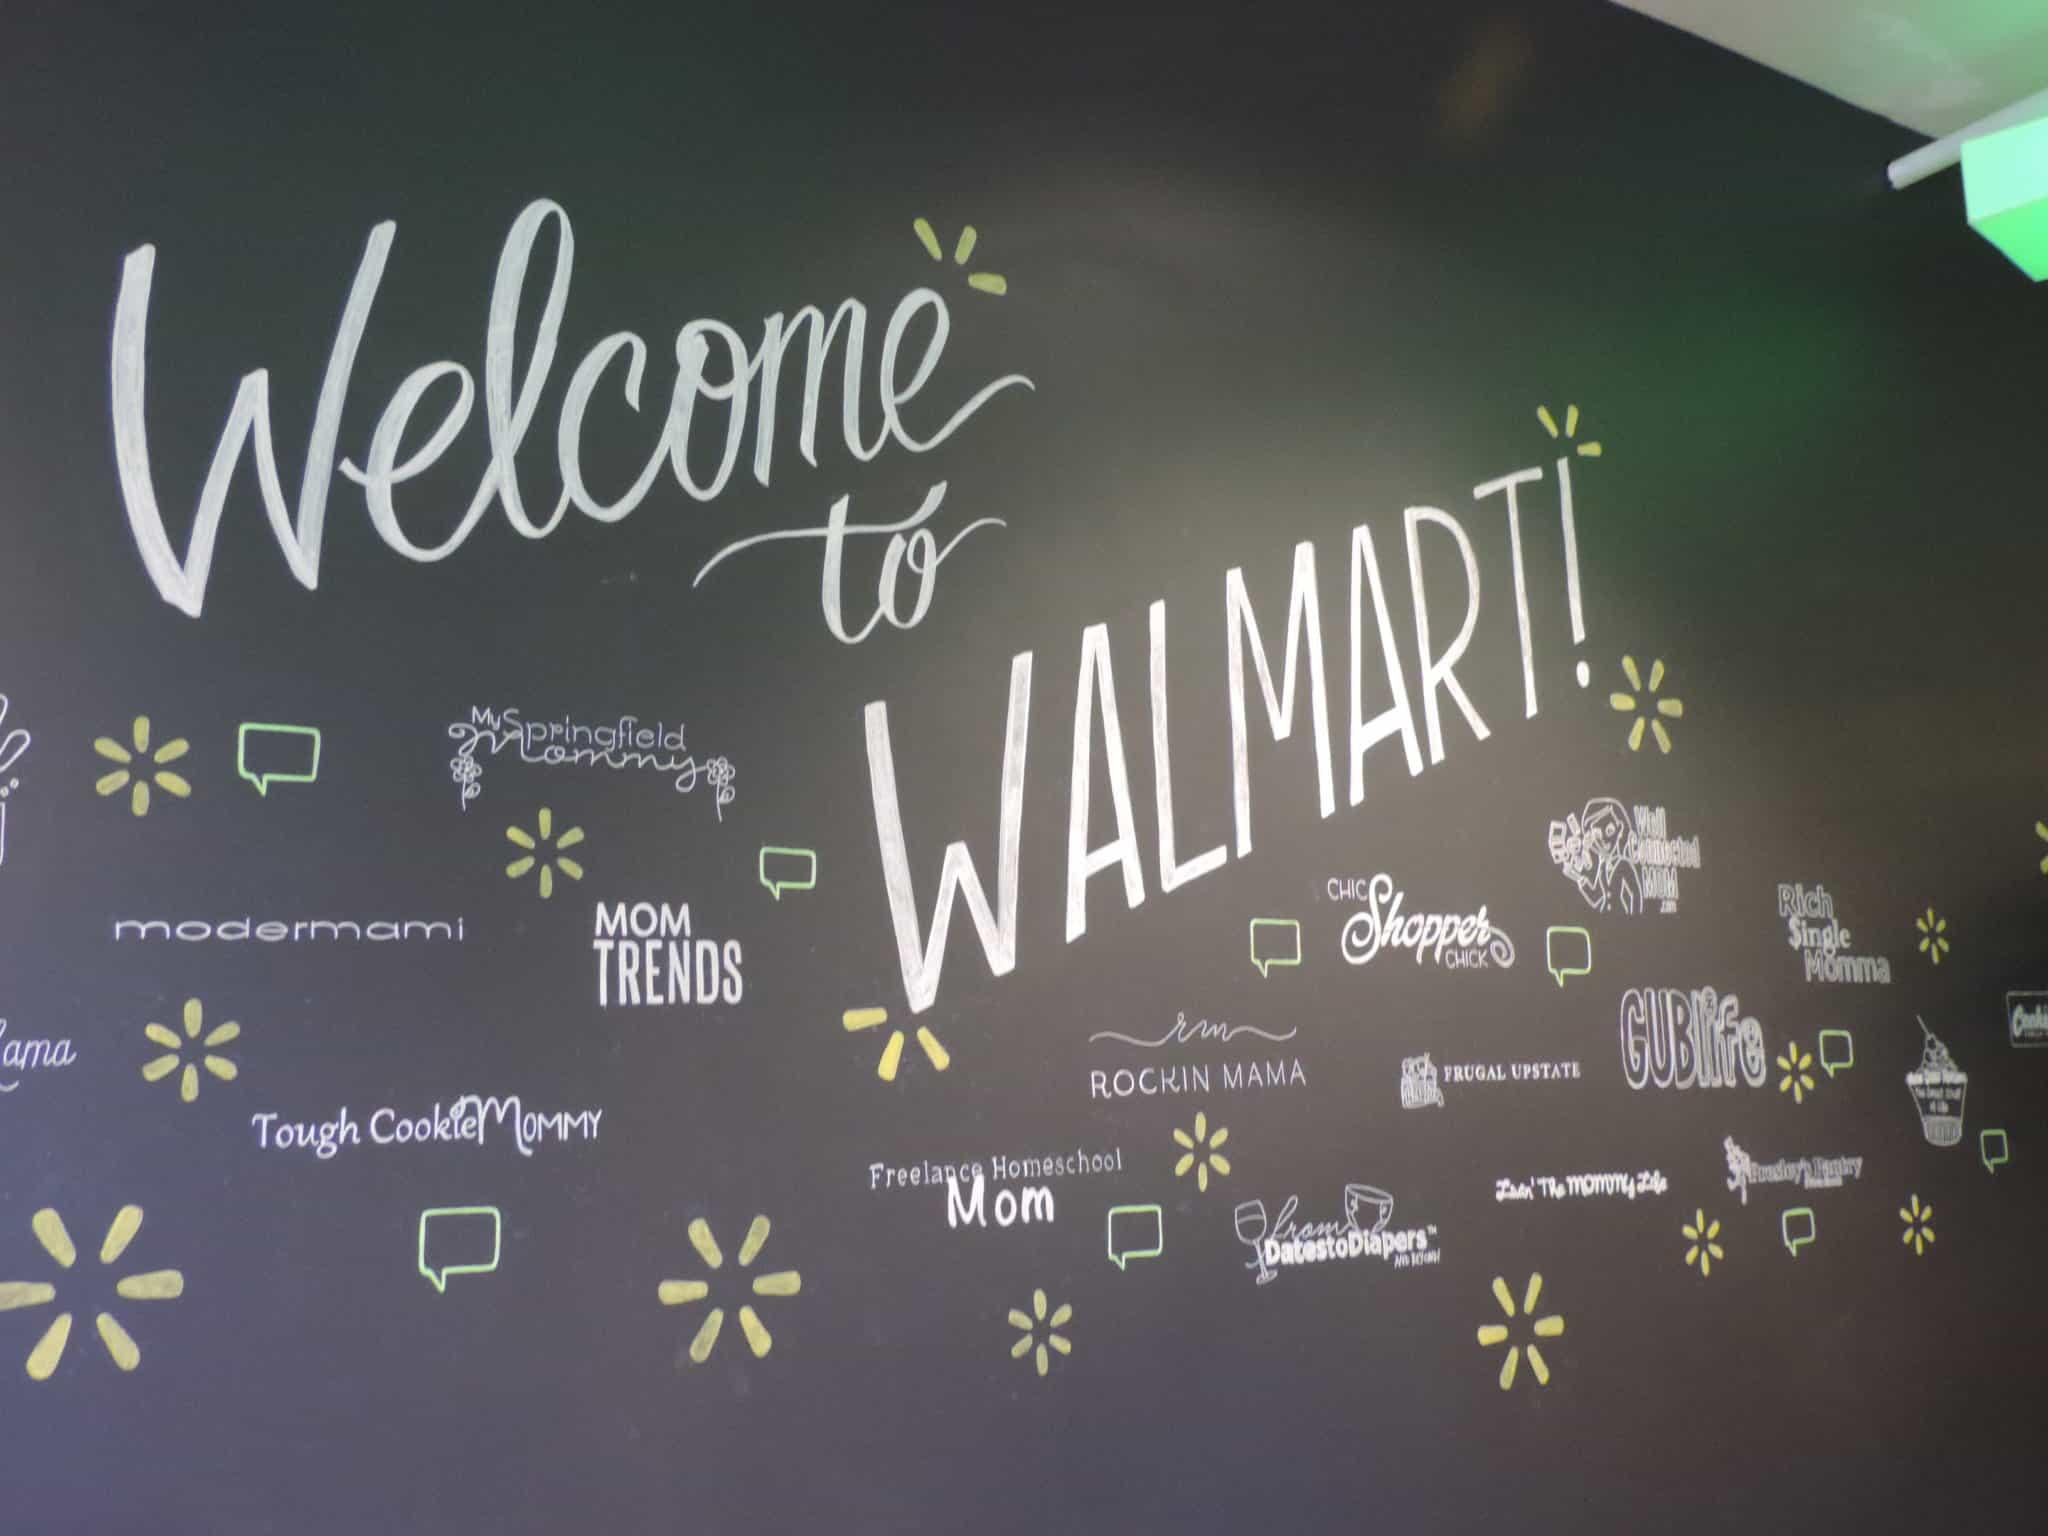 Single Mom California Dreamin' + My Walmart Blogger Day Event